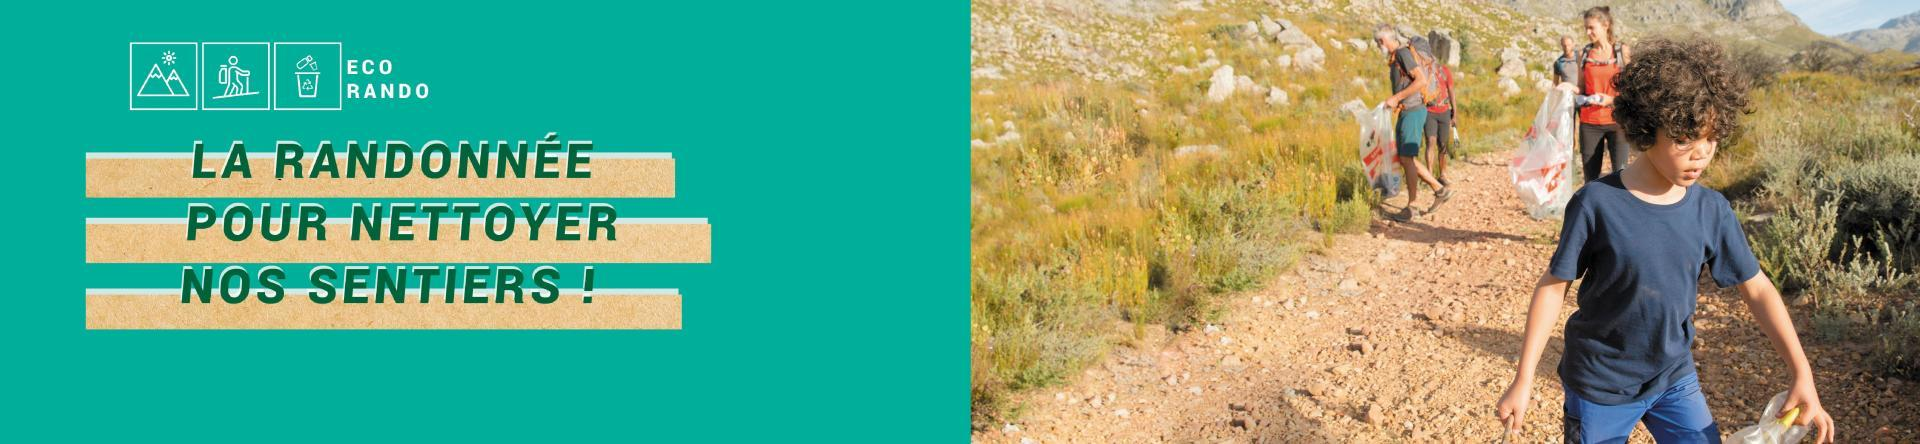 eco randonnee ramasser dechets sentiers montagne quechua decathlon